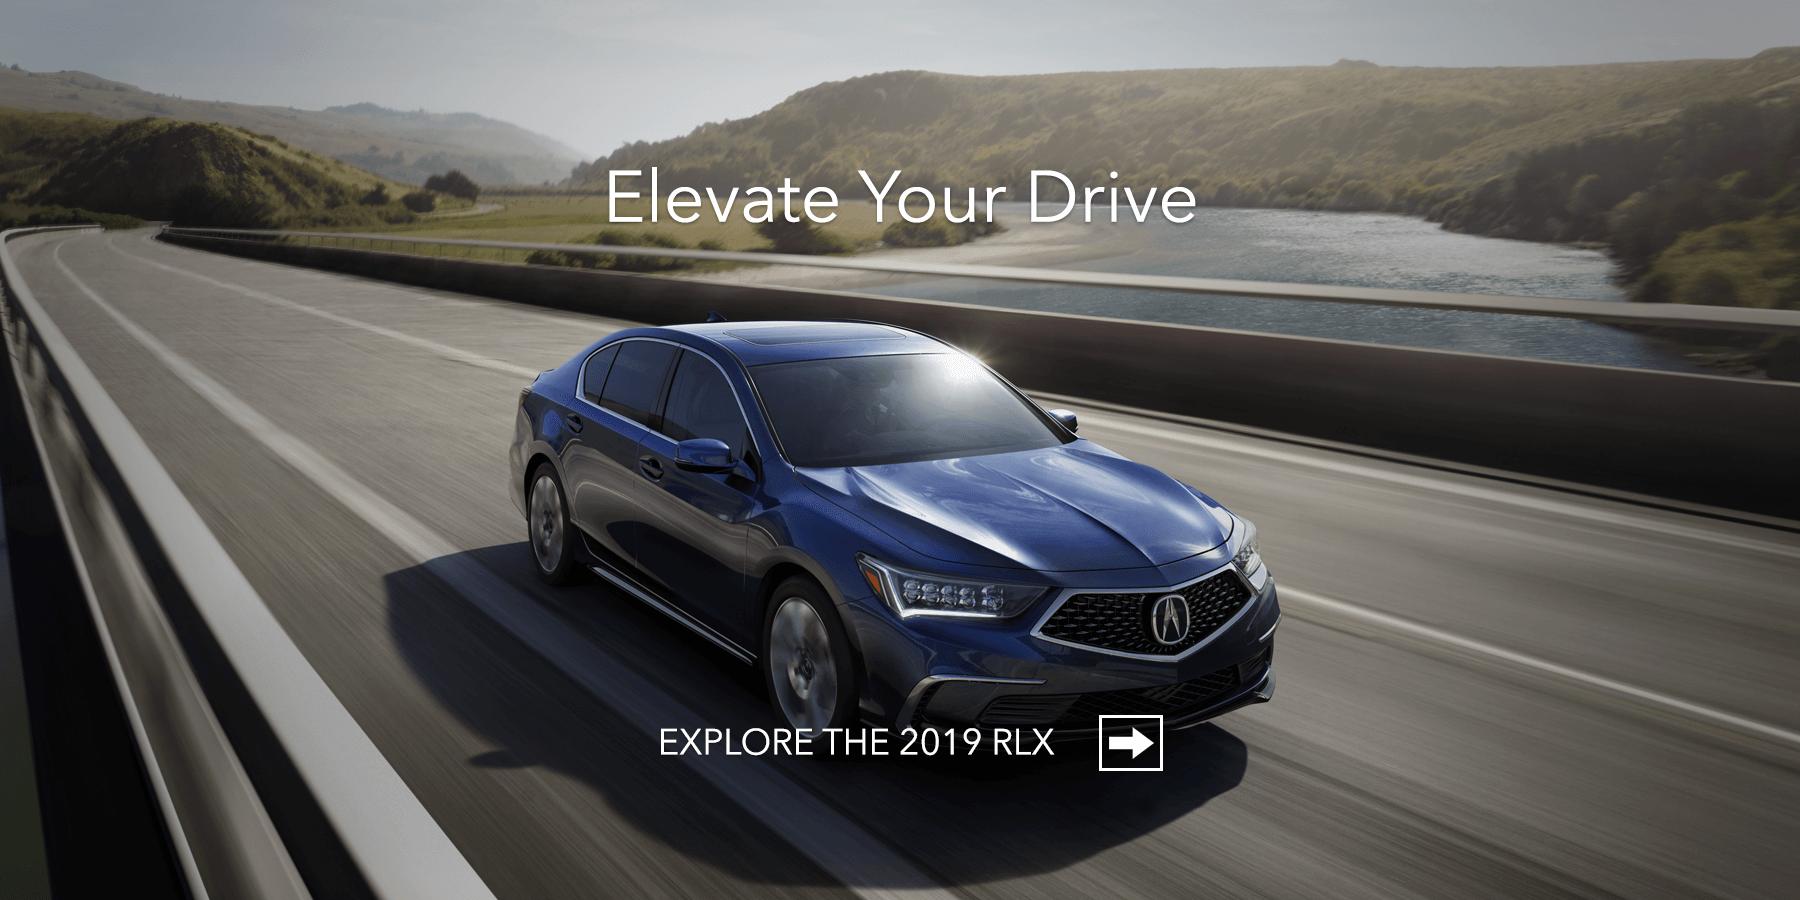 2019 Acura RLX Fathom Blue Pearl Front Angle HP Slide